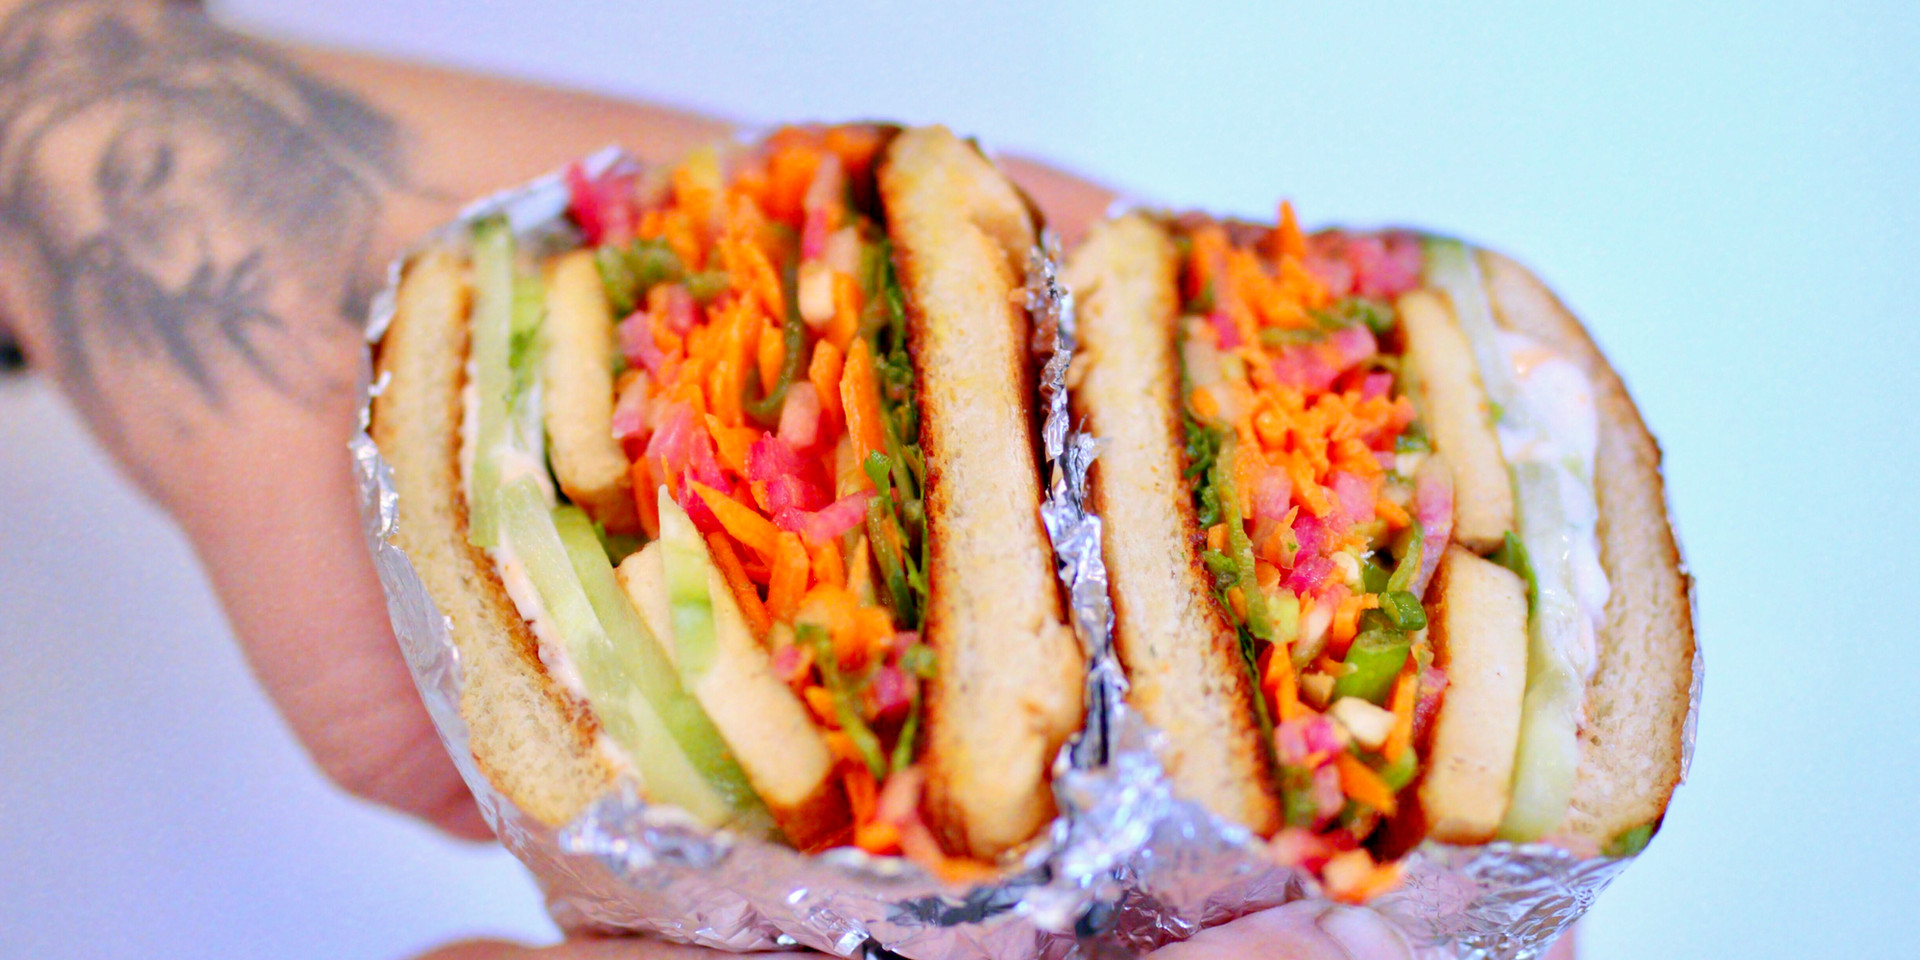 Bomb Mi Sandwich